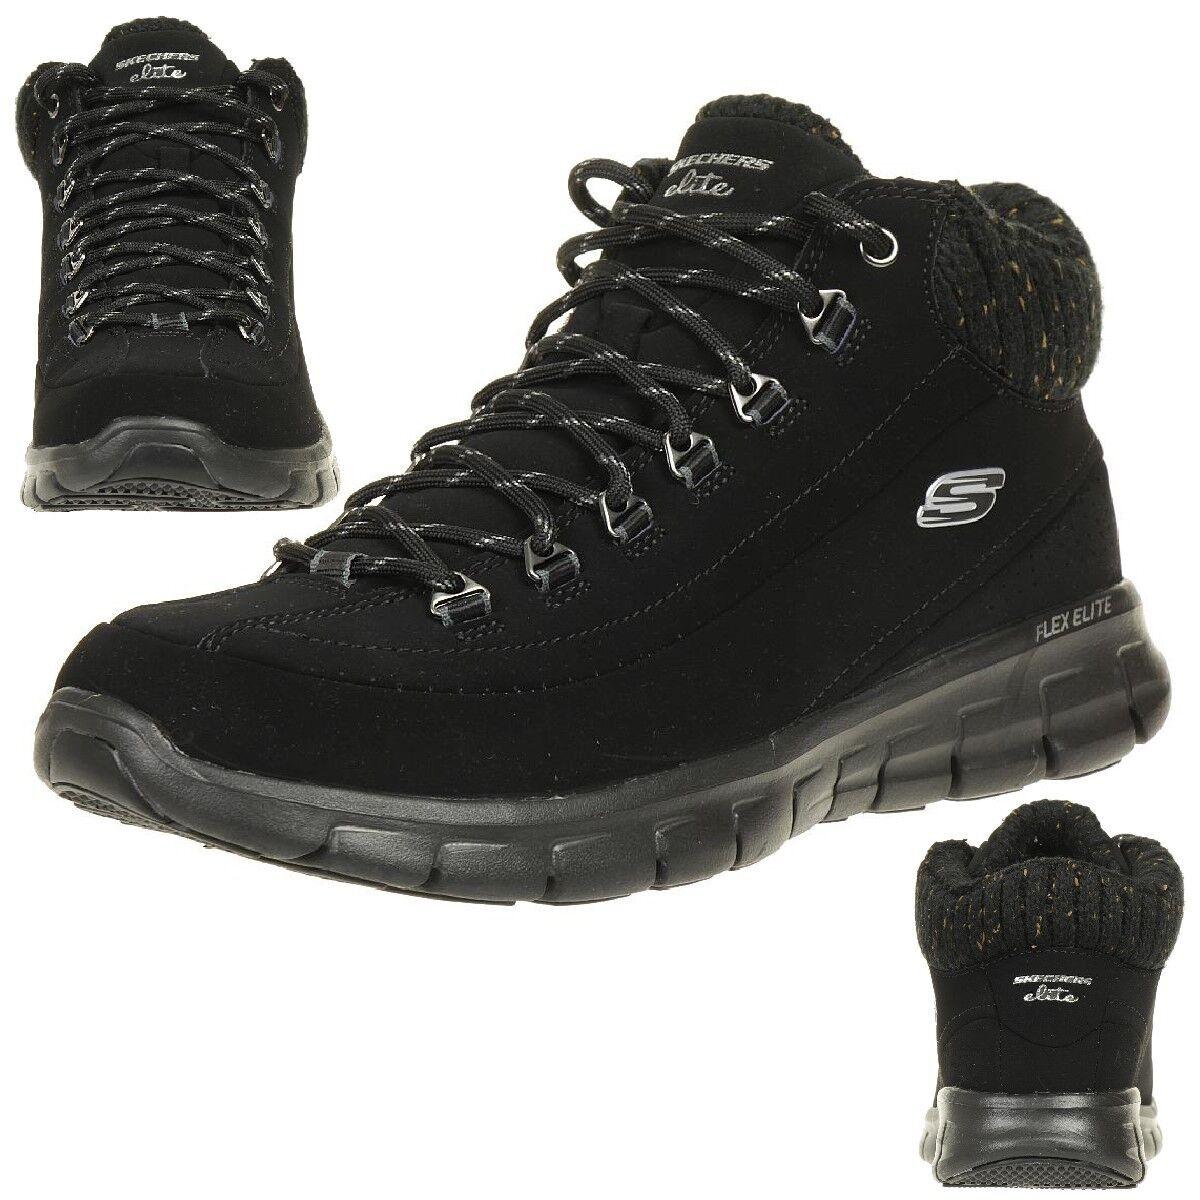 Skechers Synergy invierno Nights botas señora invierno zapatos forradas negro bbk